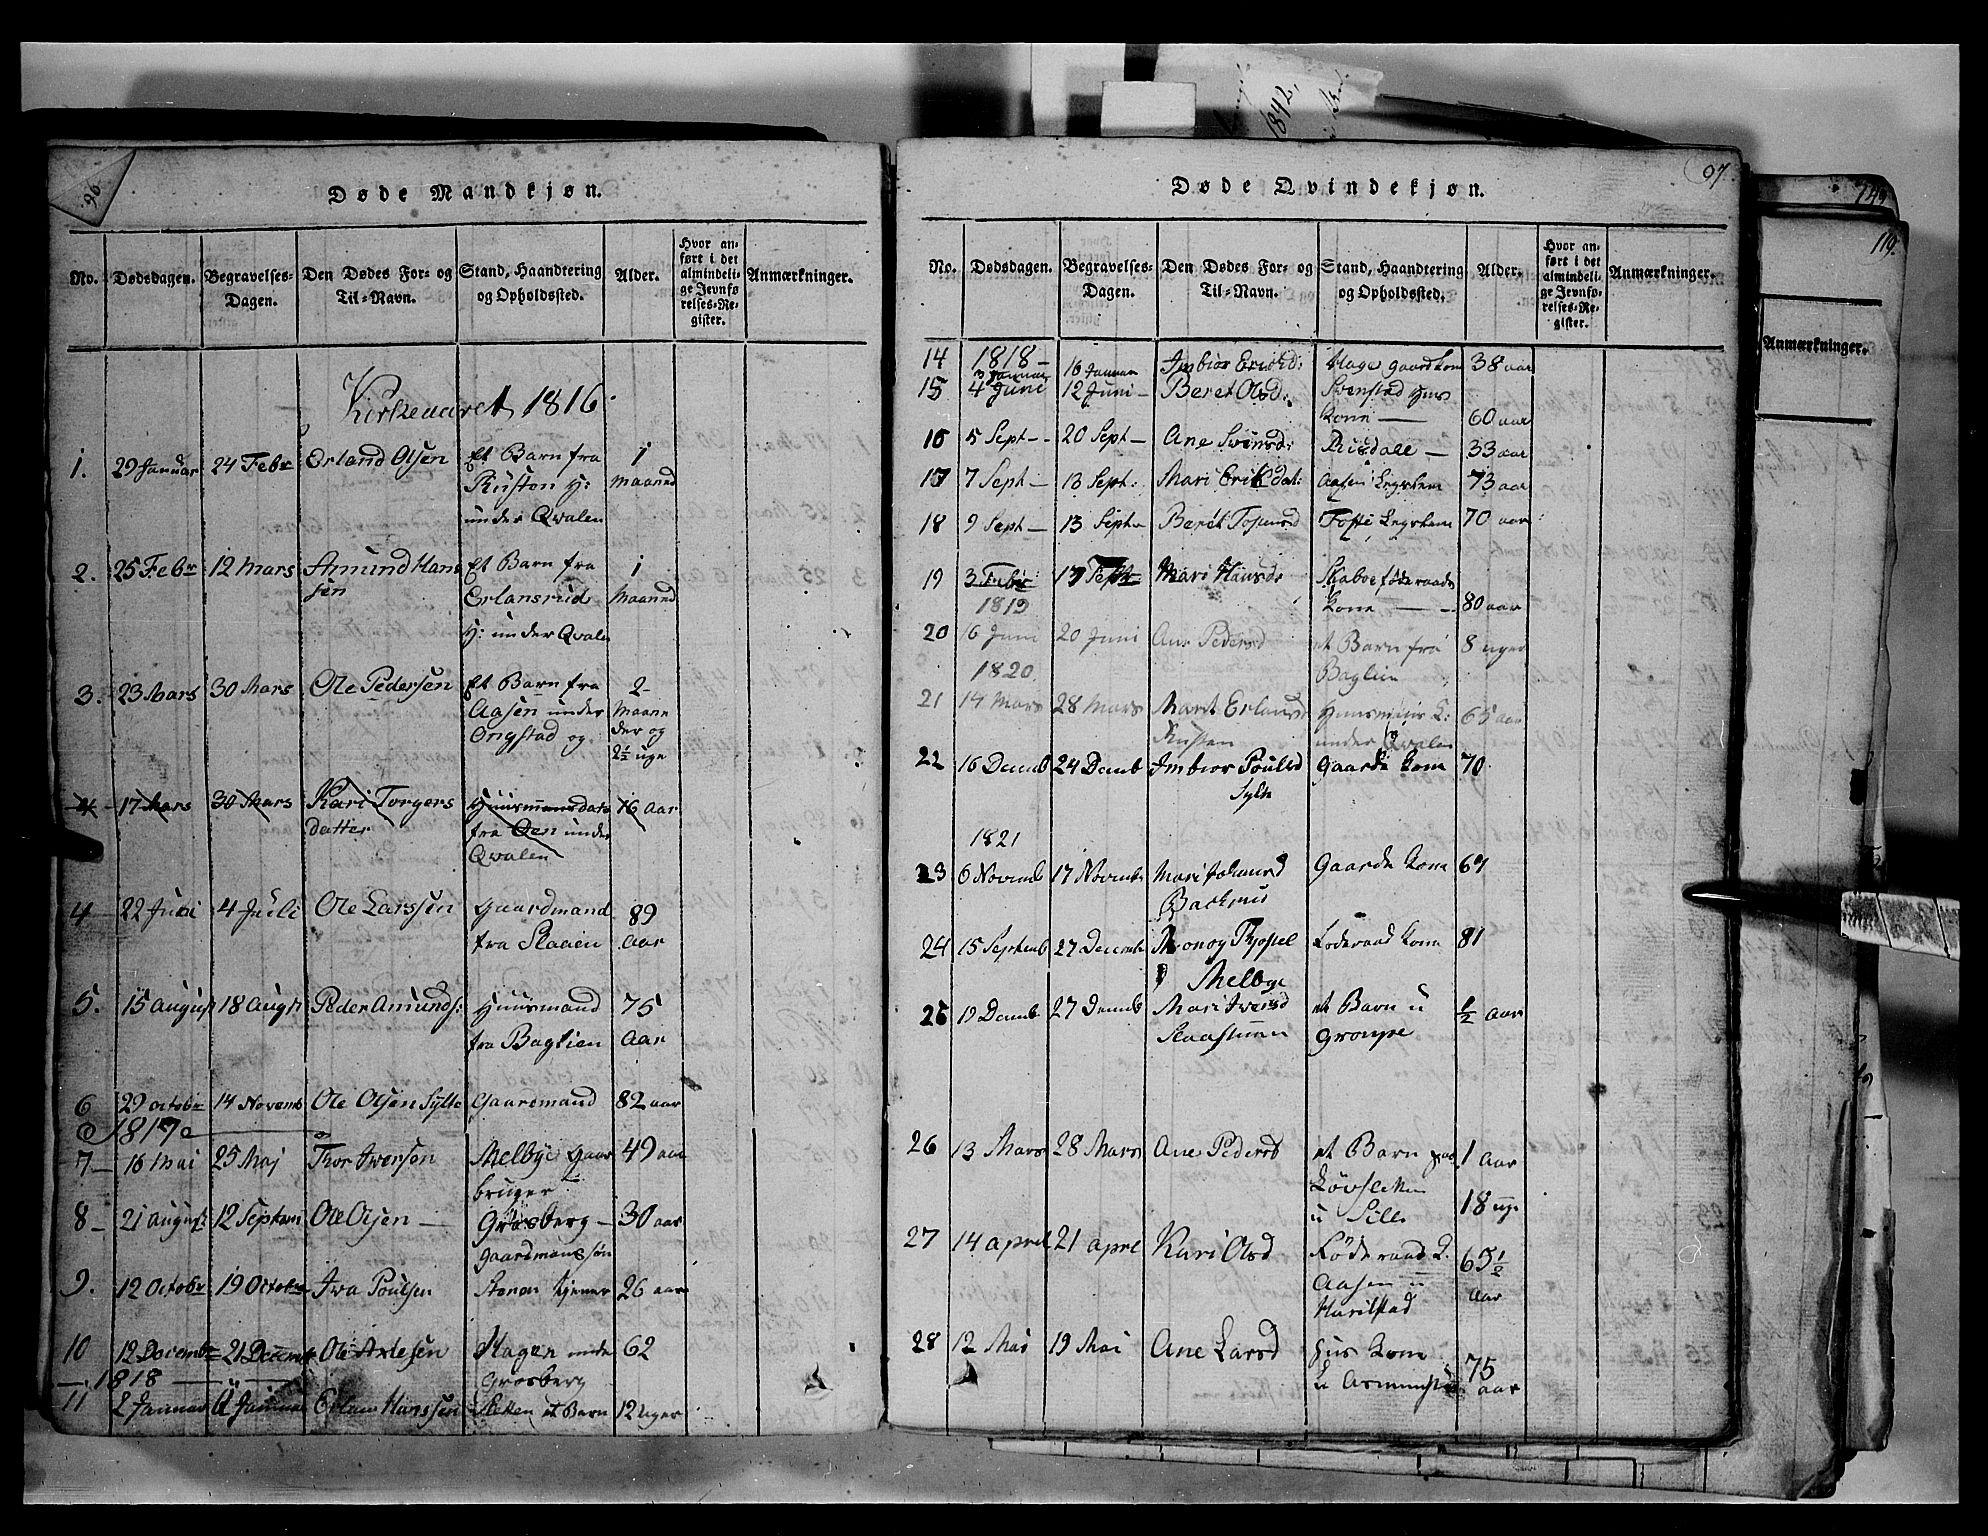 SAH, Fron prestekontor, H/Ha/Hab/L0003: Klokkerbok nr. 3, 1816-1850, s. 97